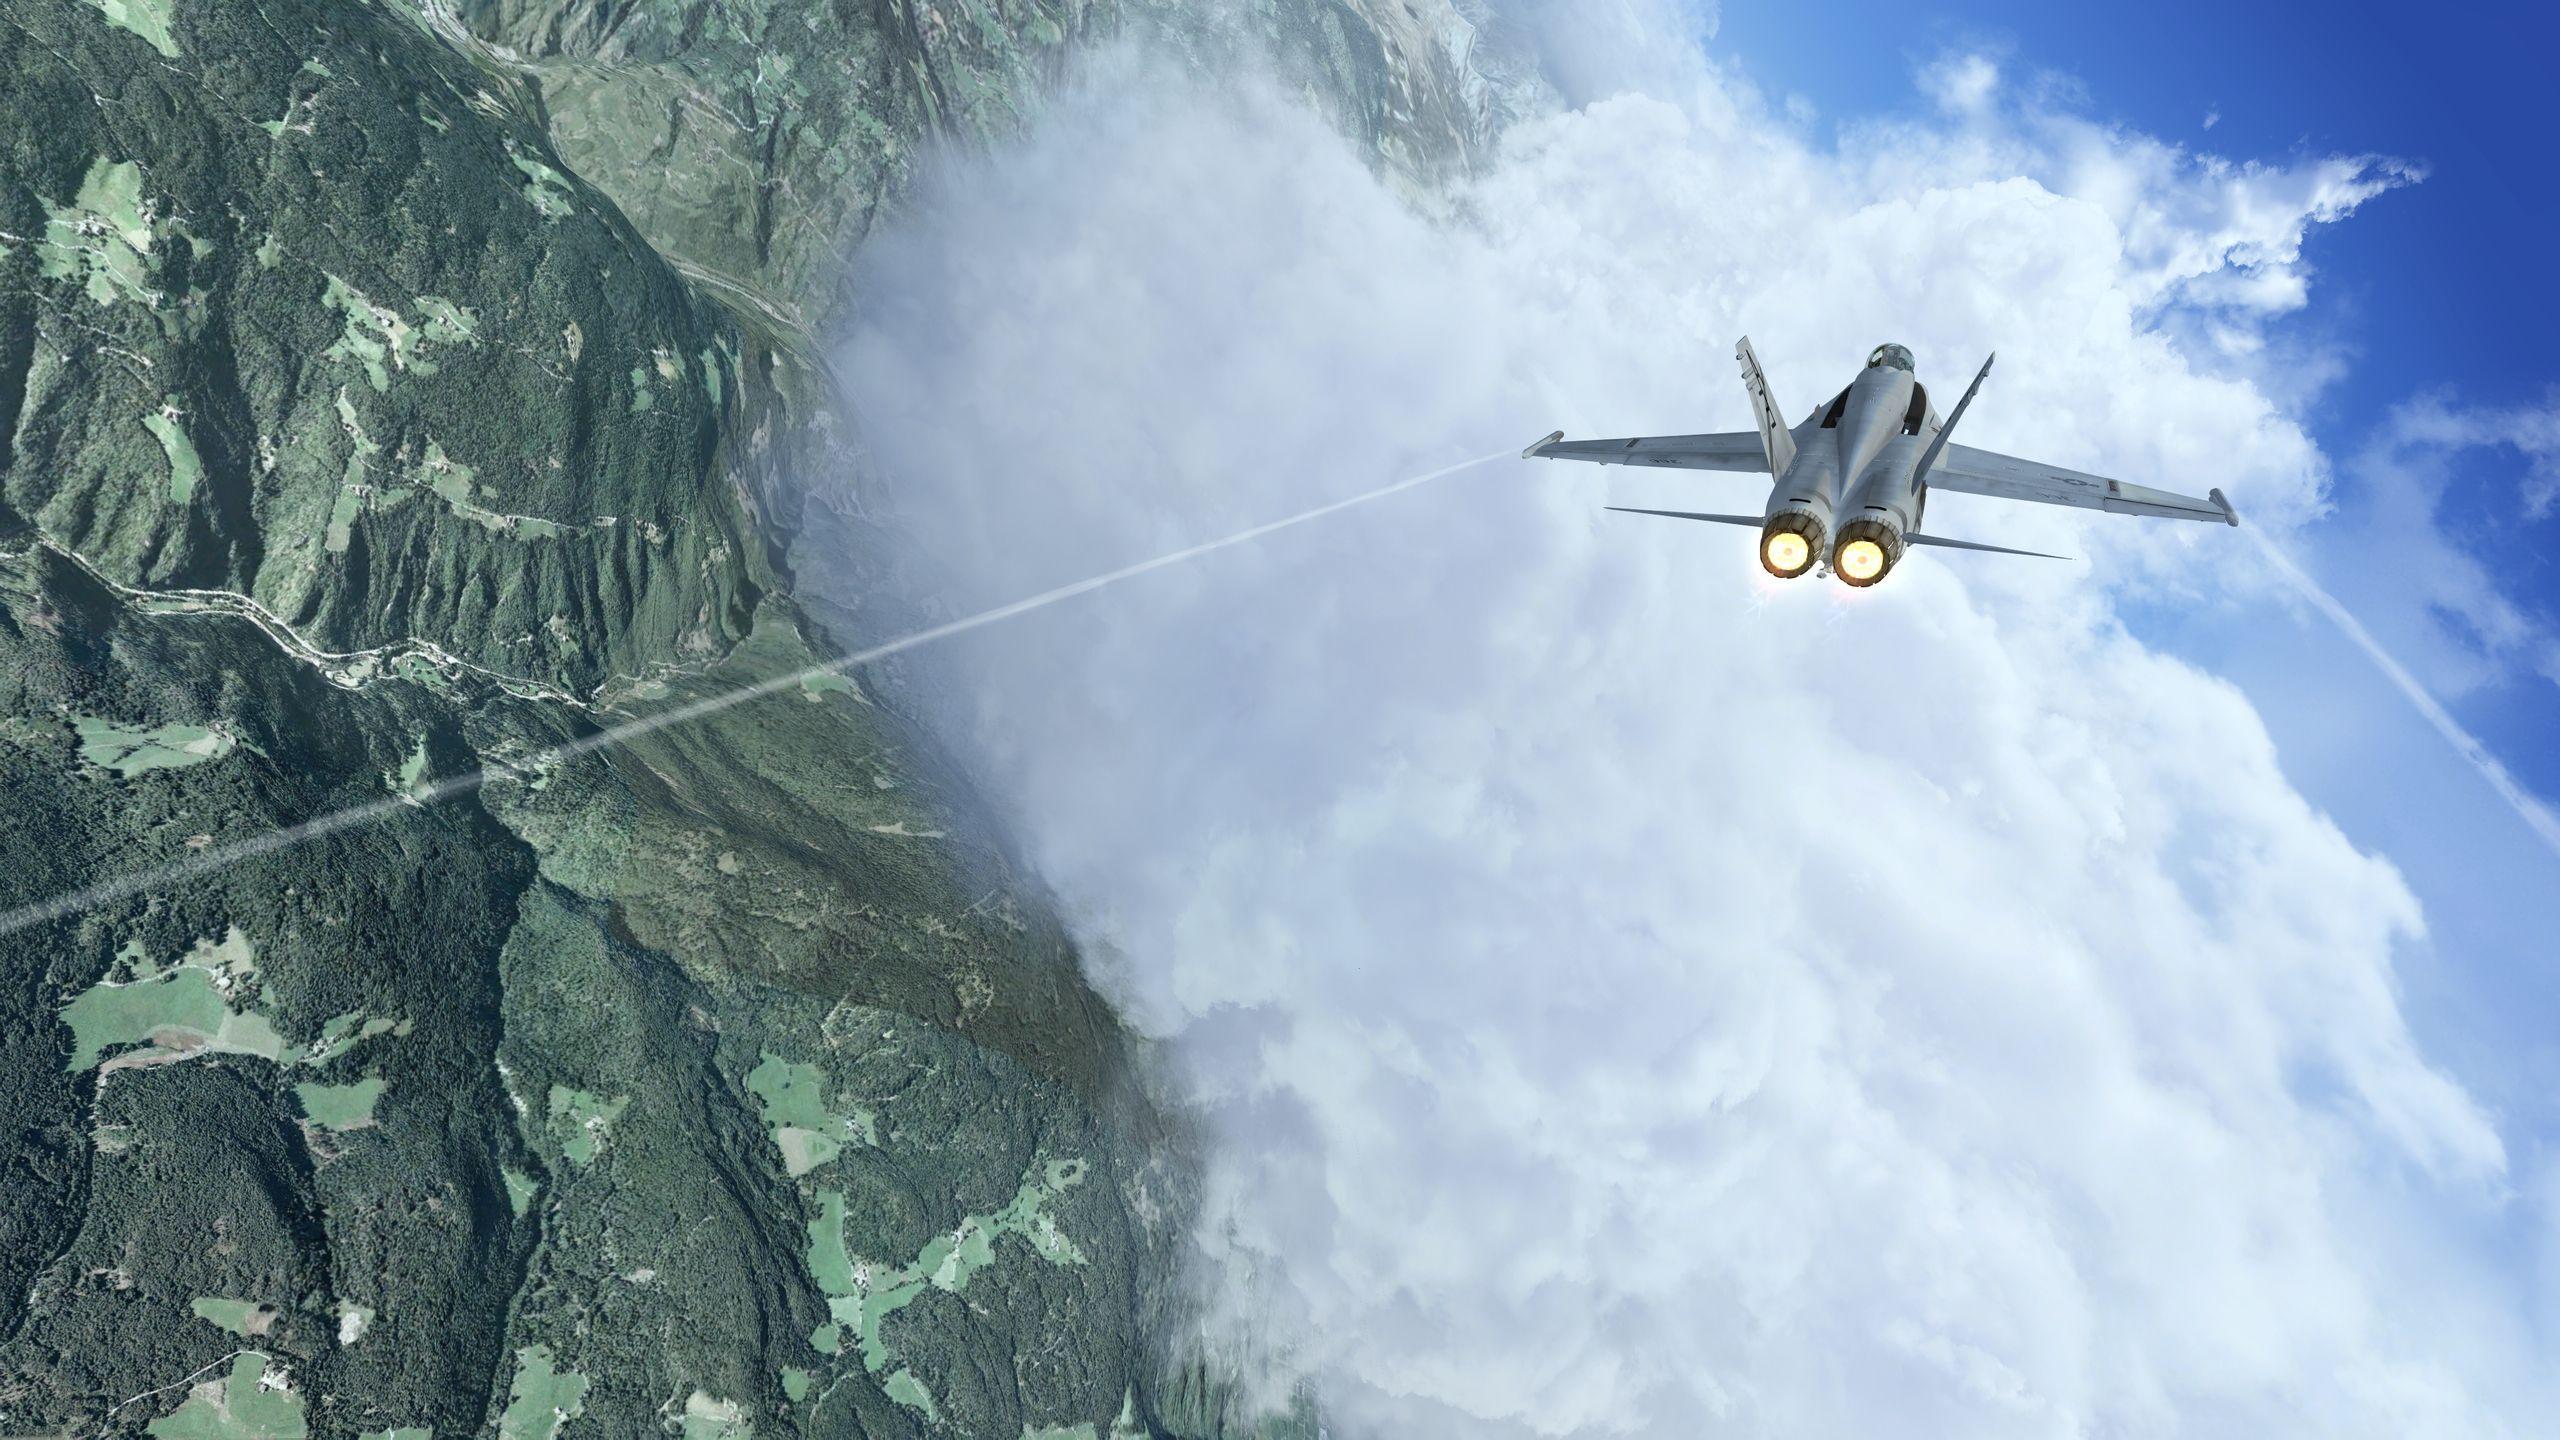 Flight Simulator HD Wallpaper 1920x1080 Microsoft Flight Simulator 2560x1440